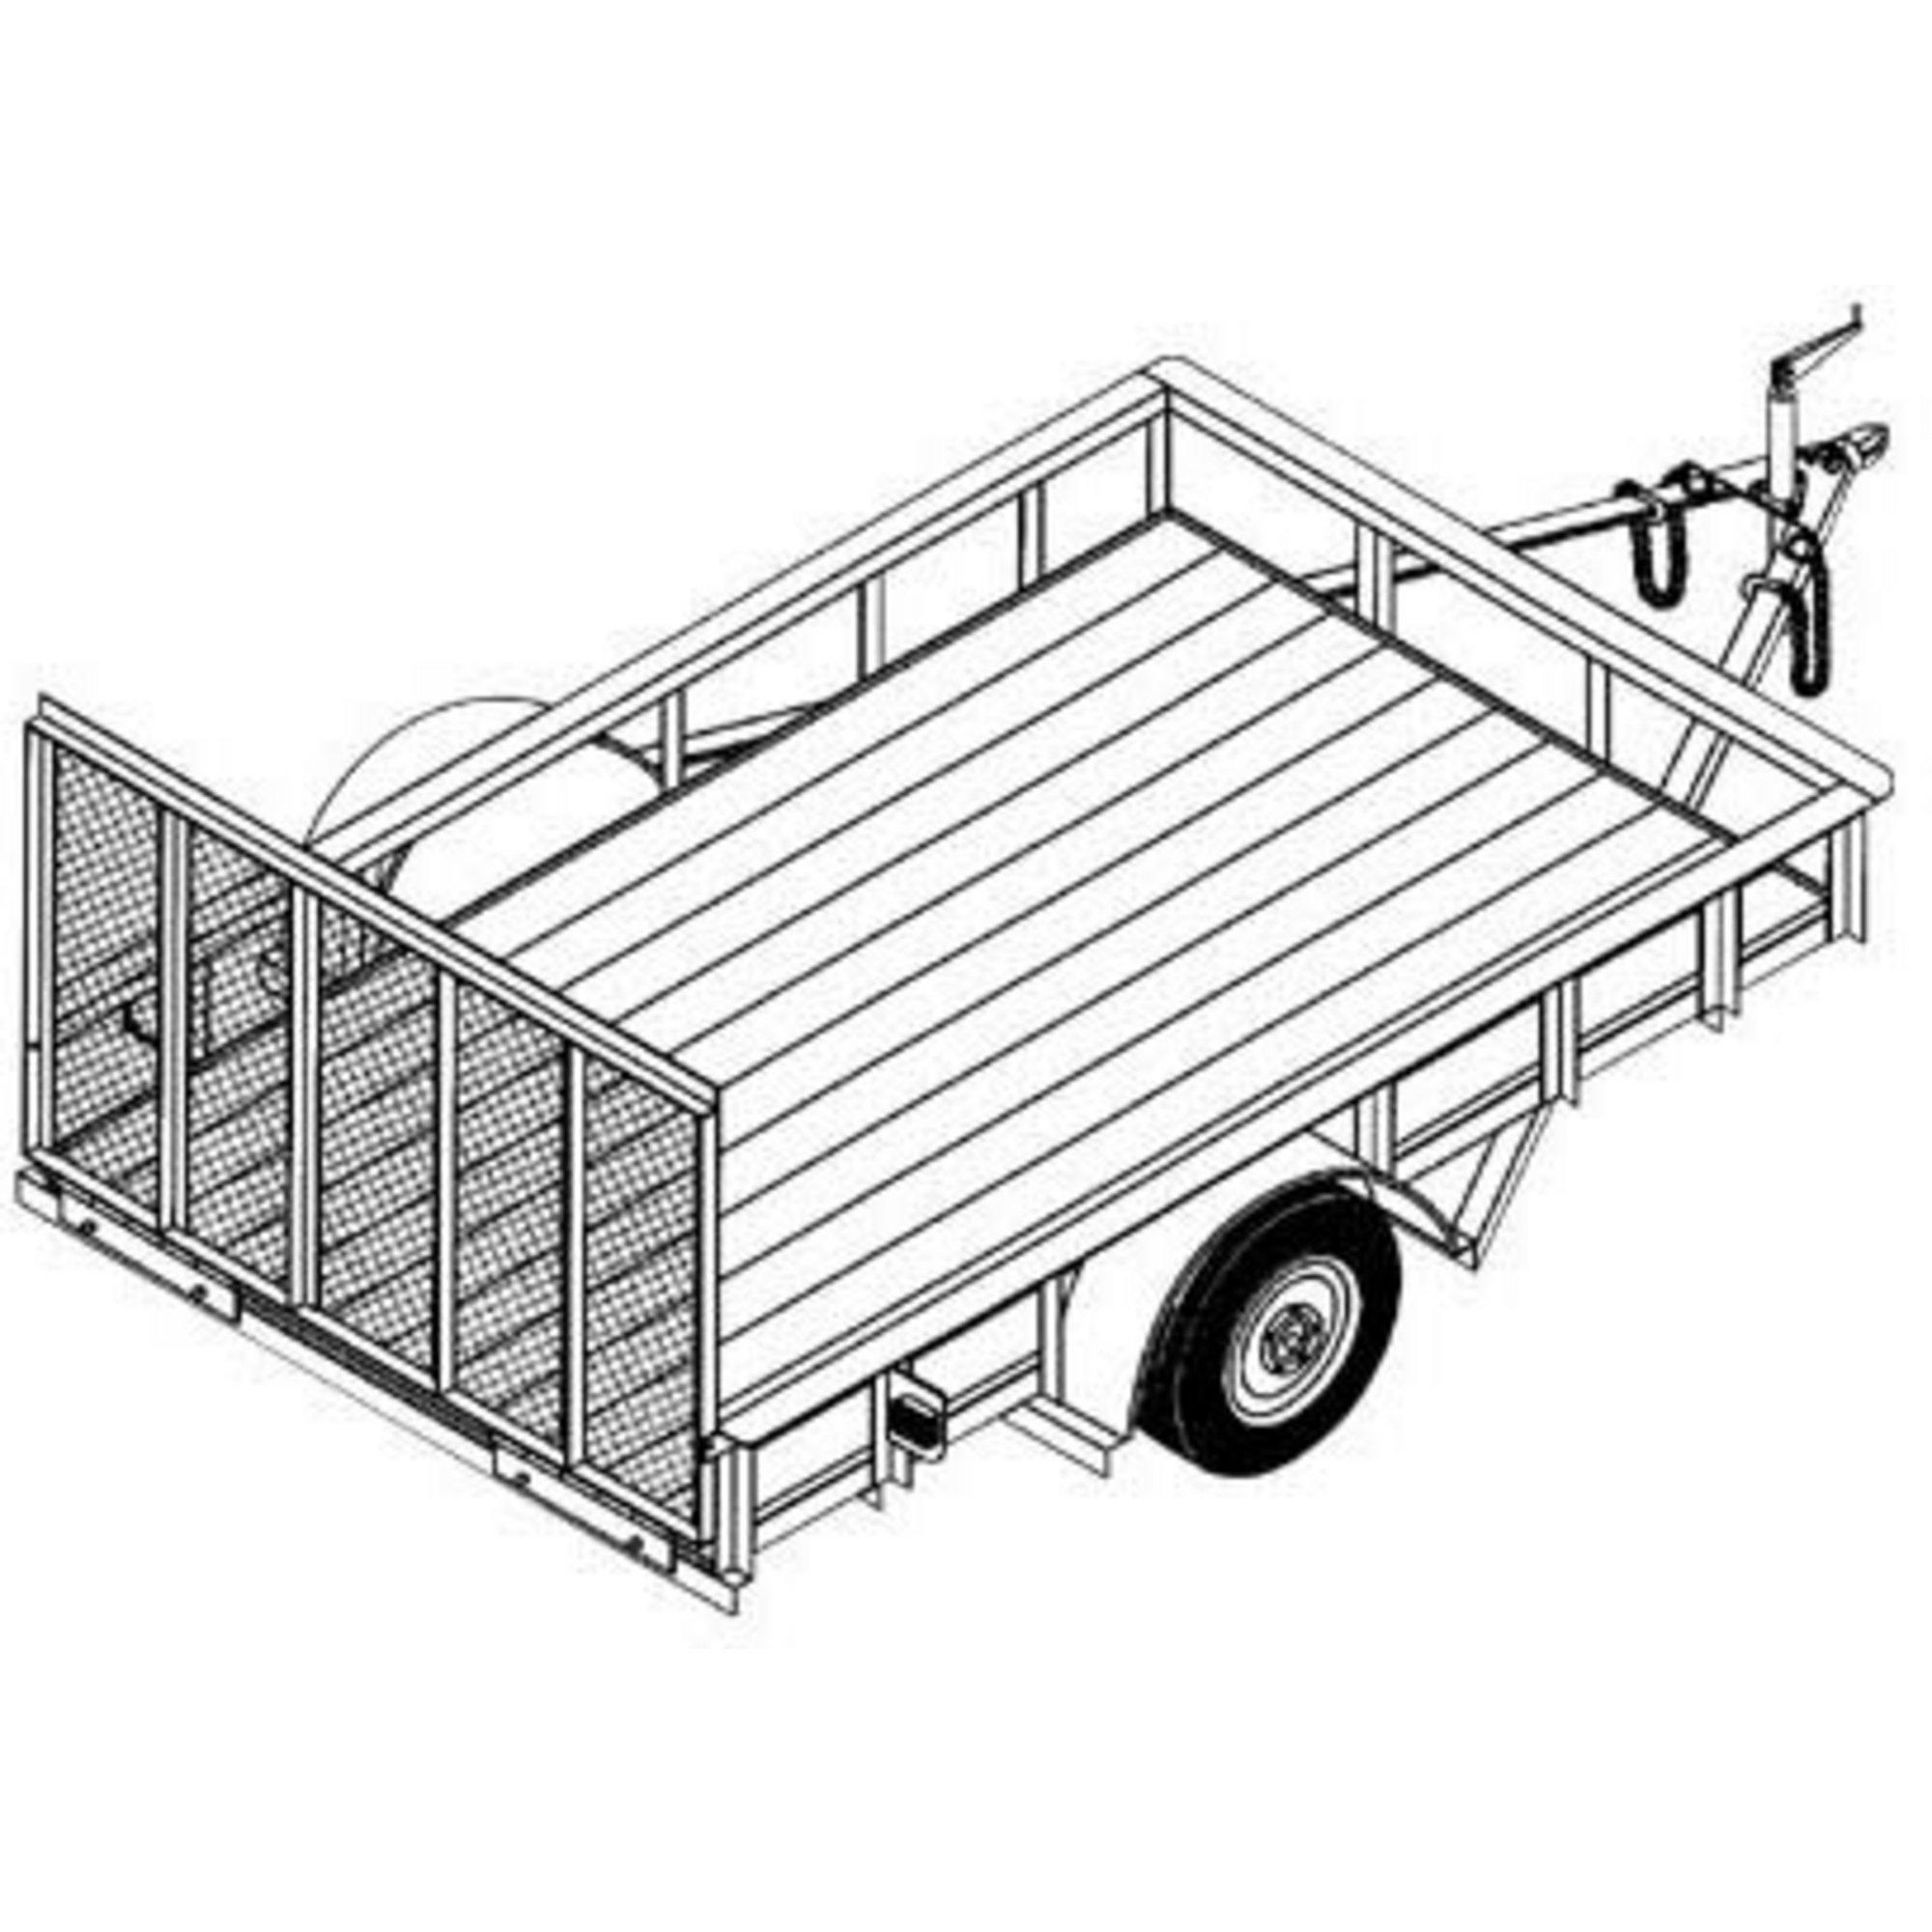 Aluminum Utility Truck Beds